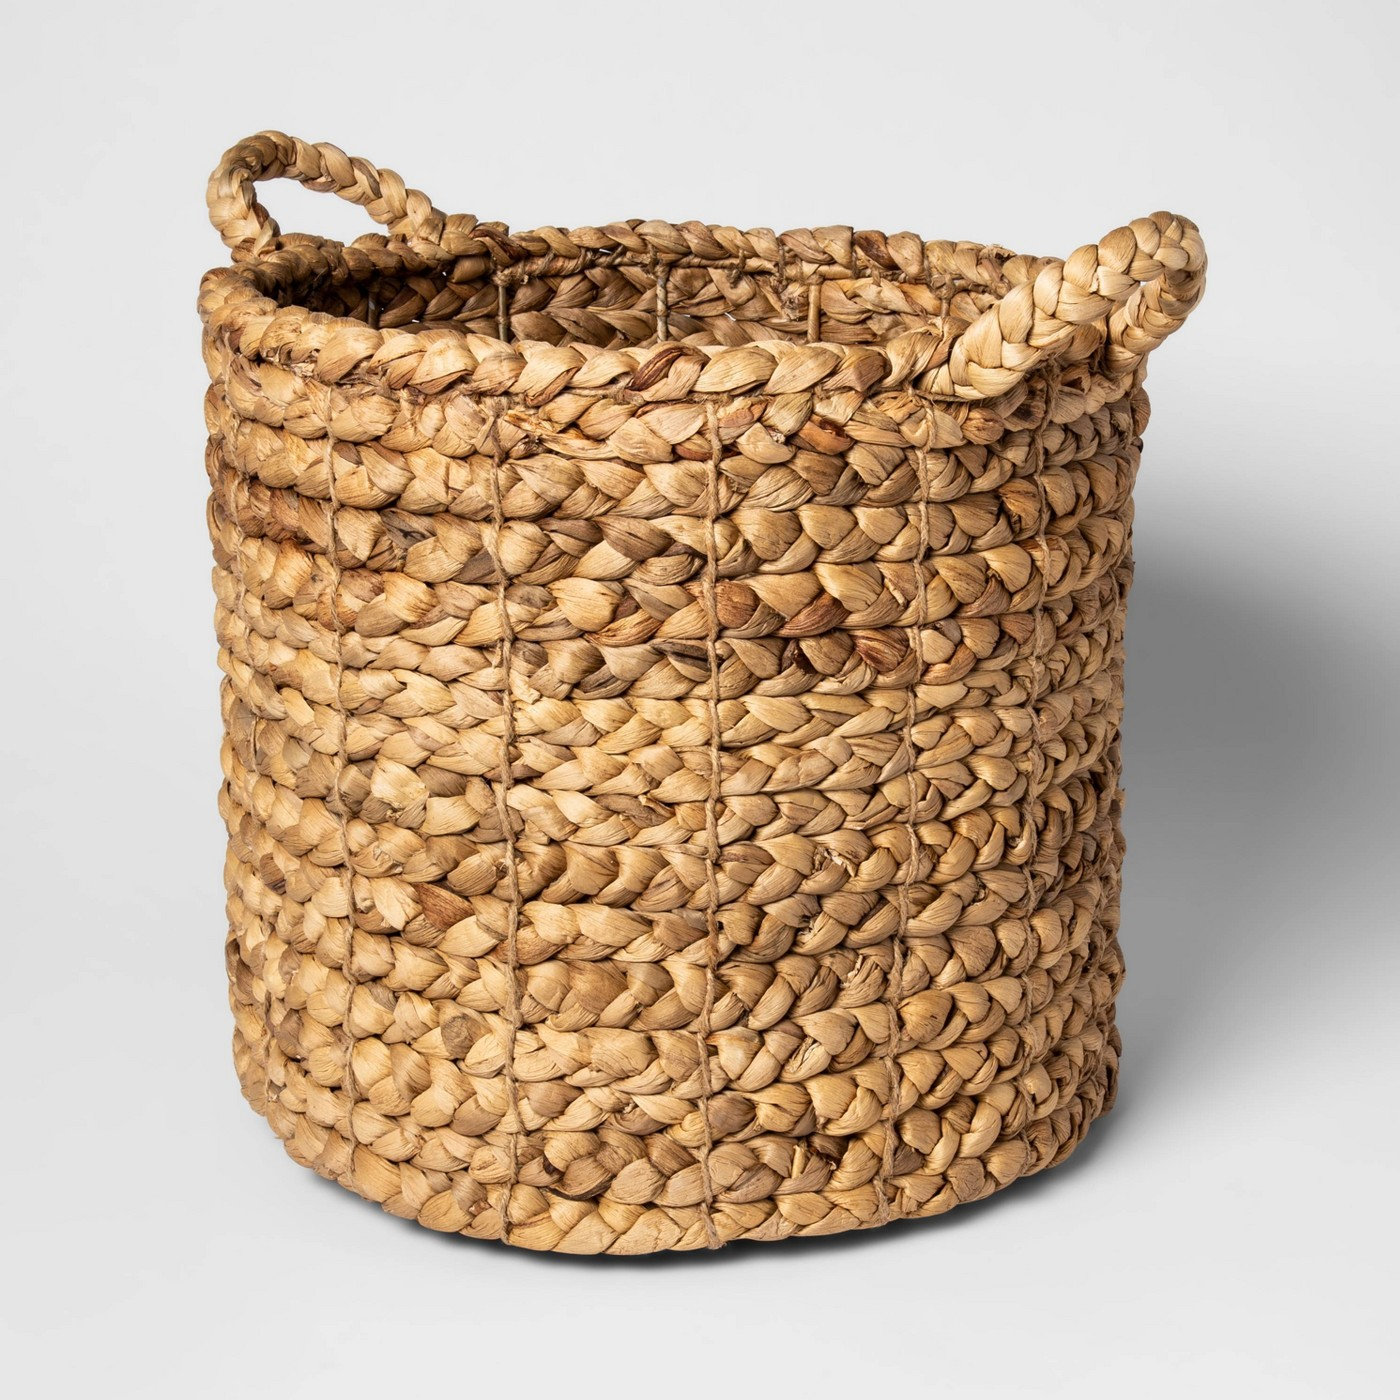 "Decorative Basket Natural 13""x14"" - Threshold⢠- image 1 of 1"